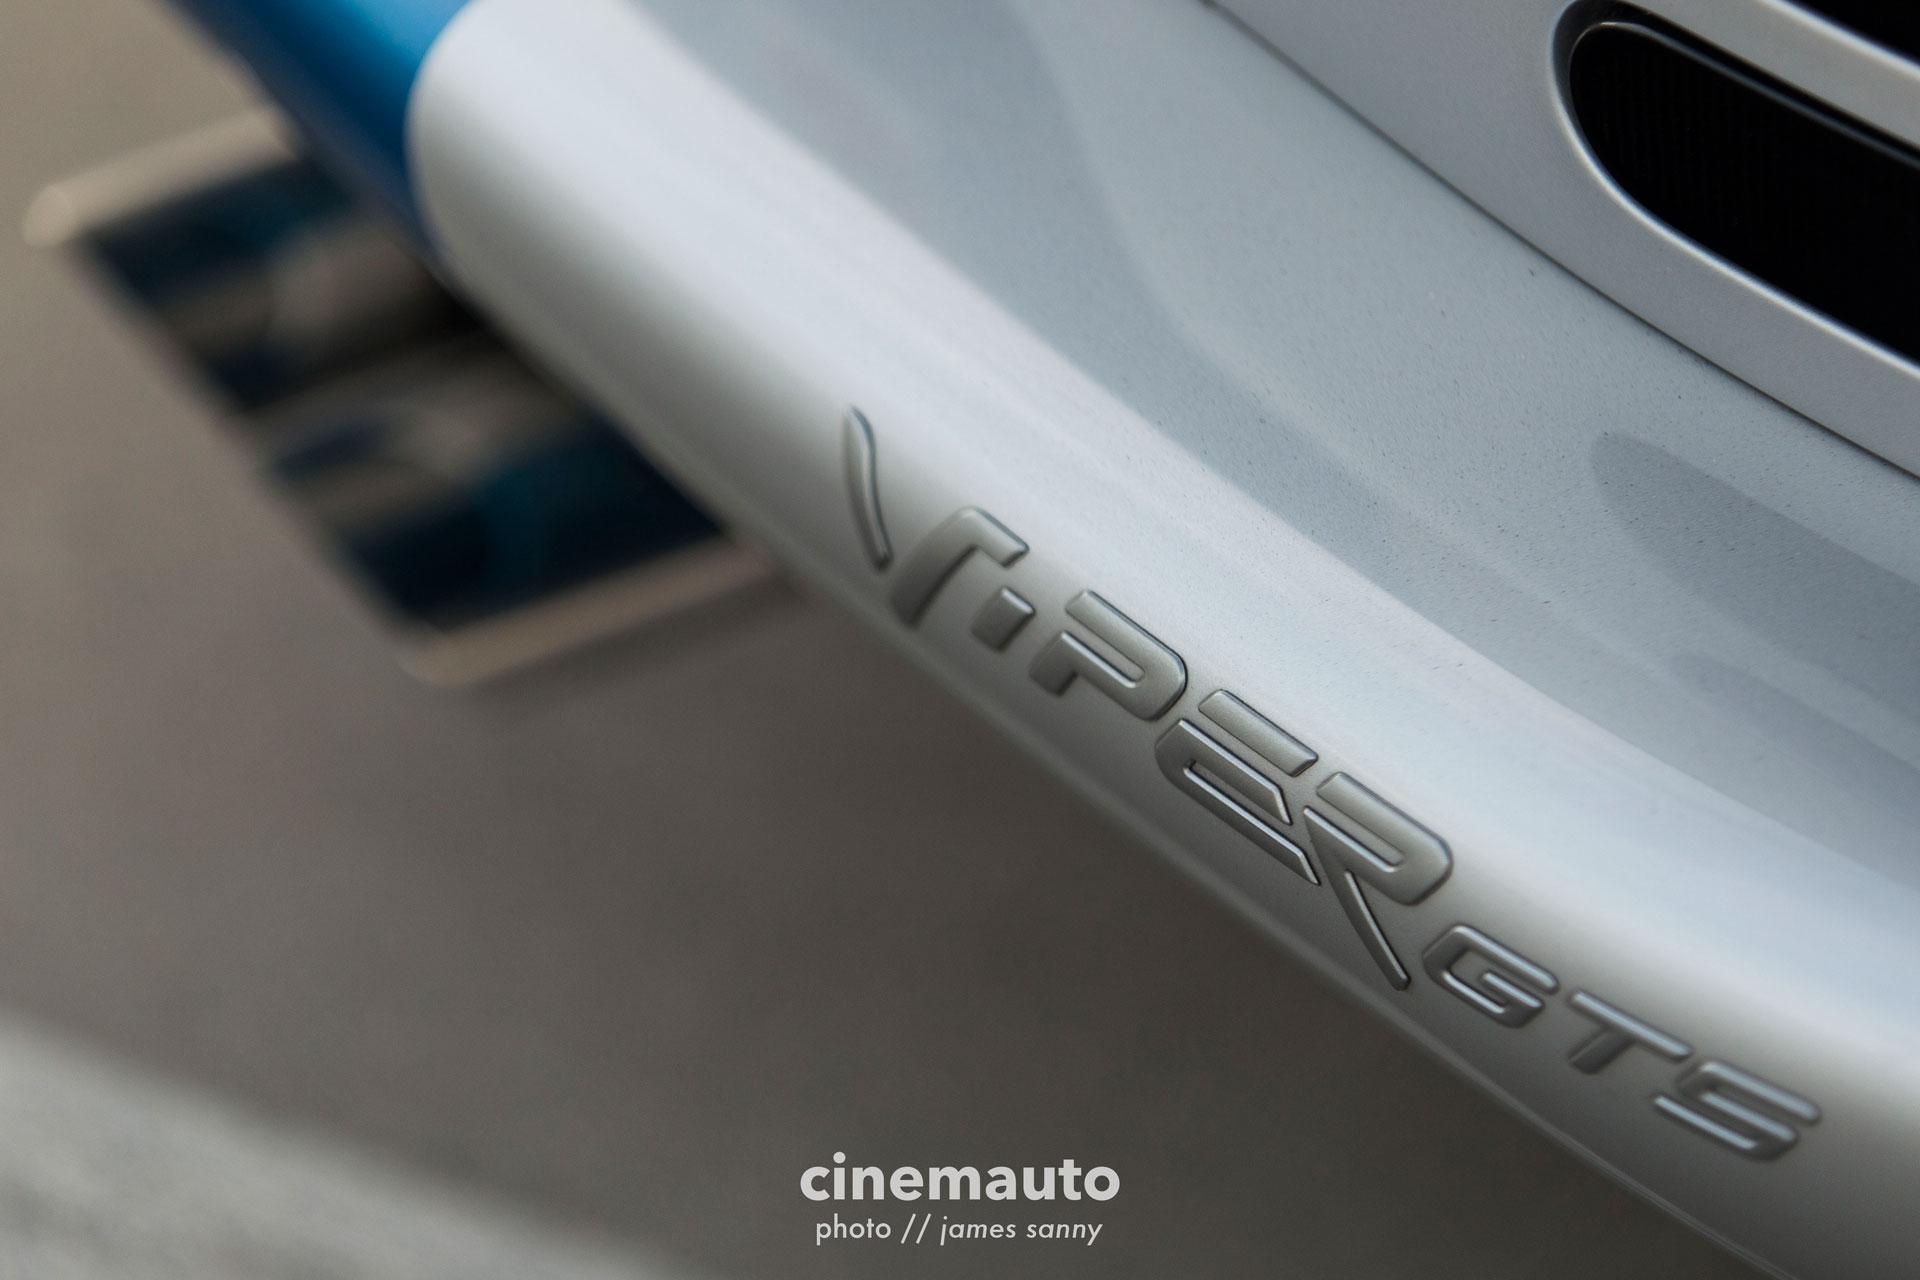 cinemauto_2-sm.jpg